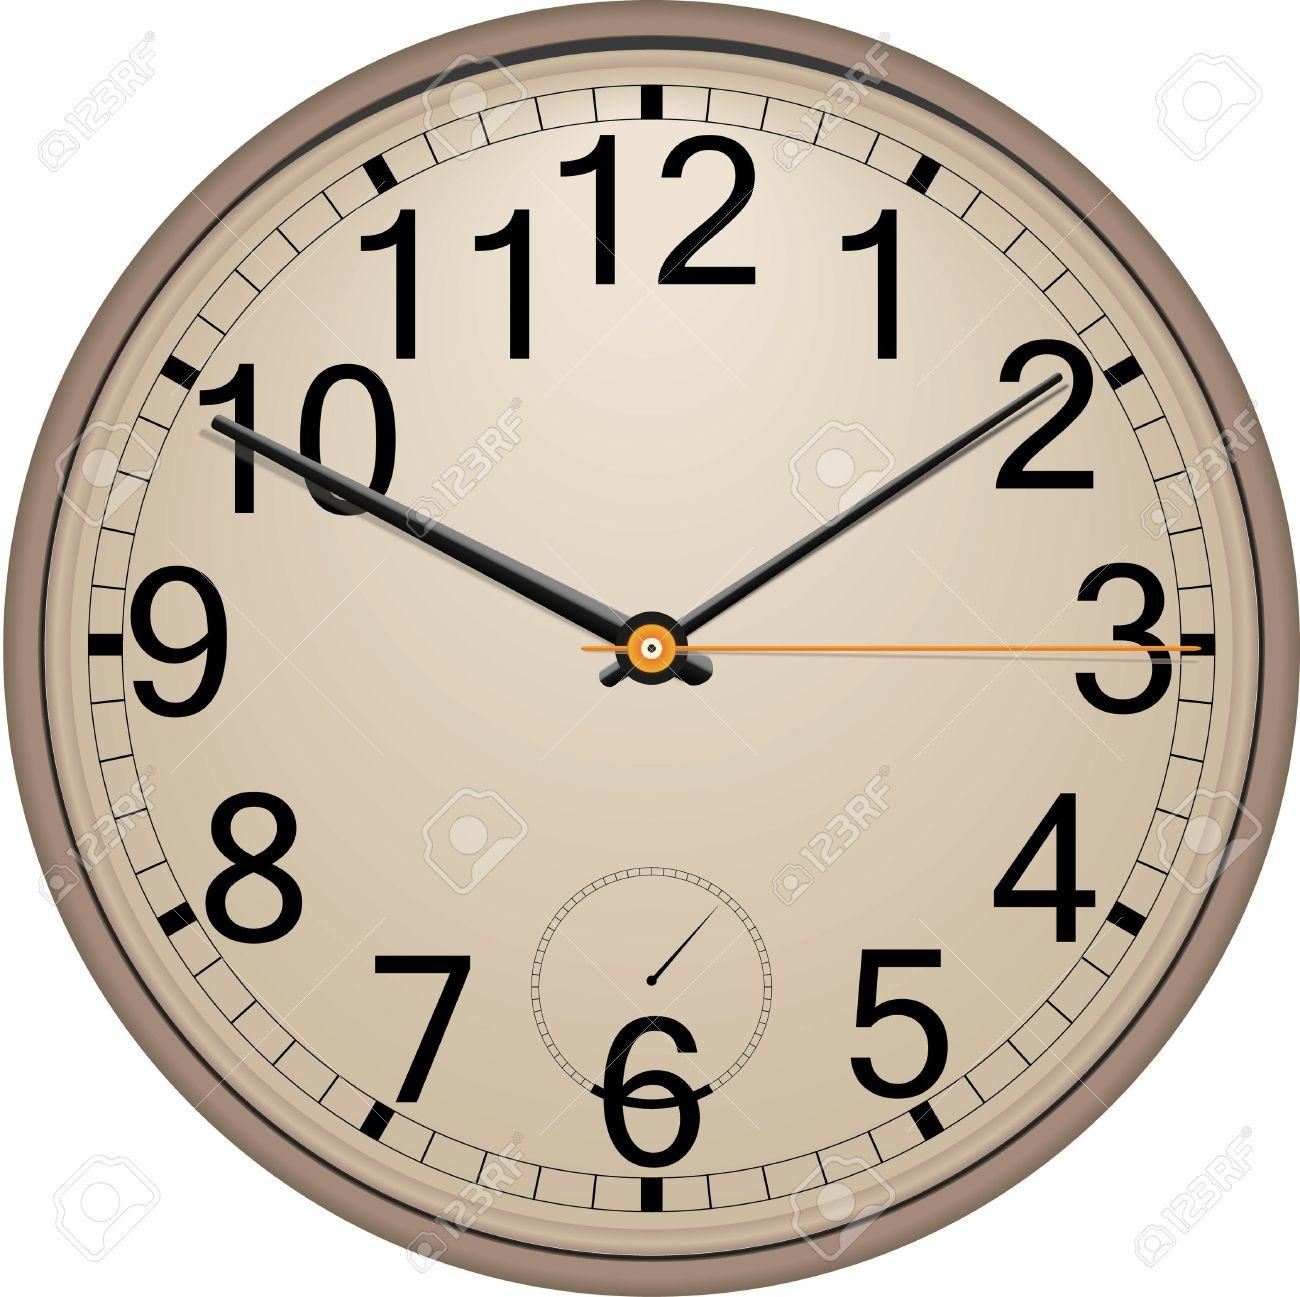 Wall Clock Royalty Free Cliparts, Vectors, And Stock Illustration.